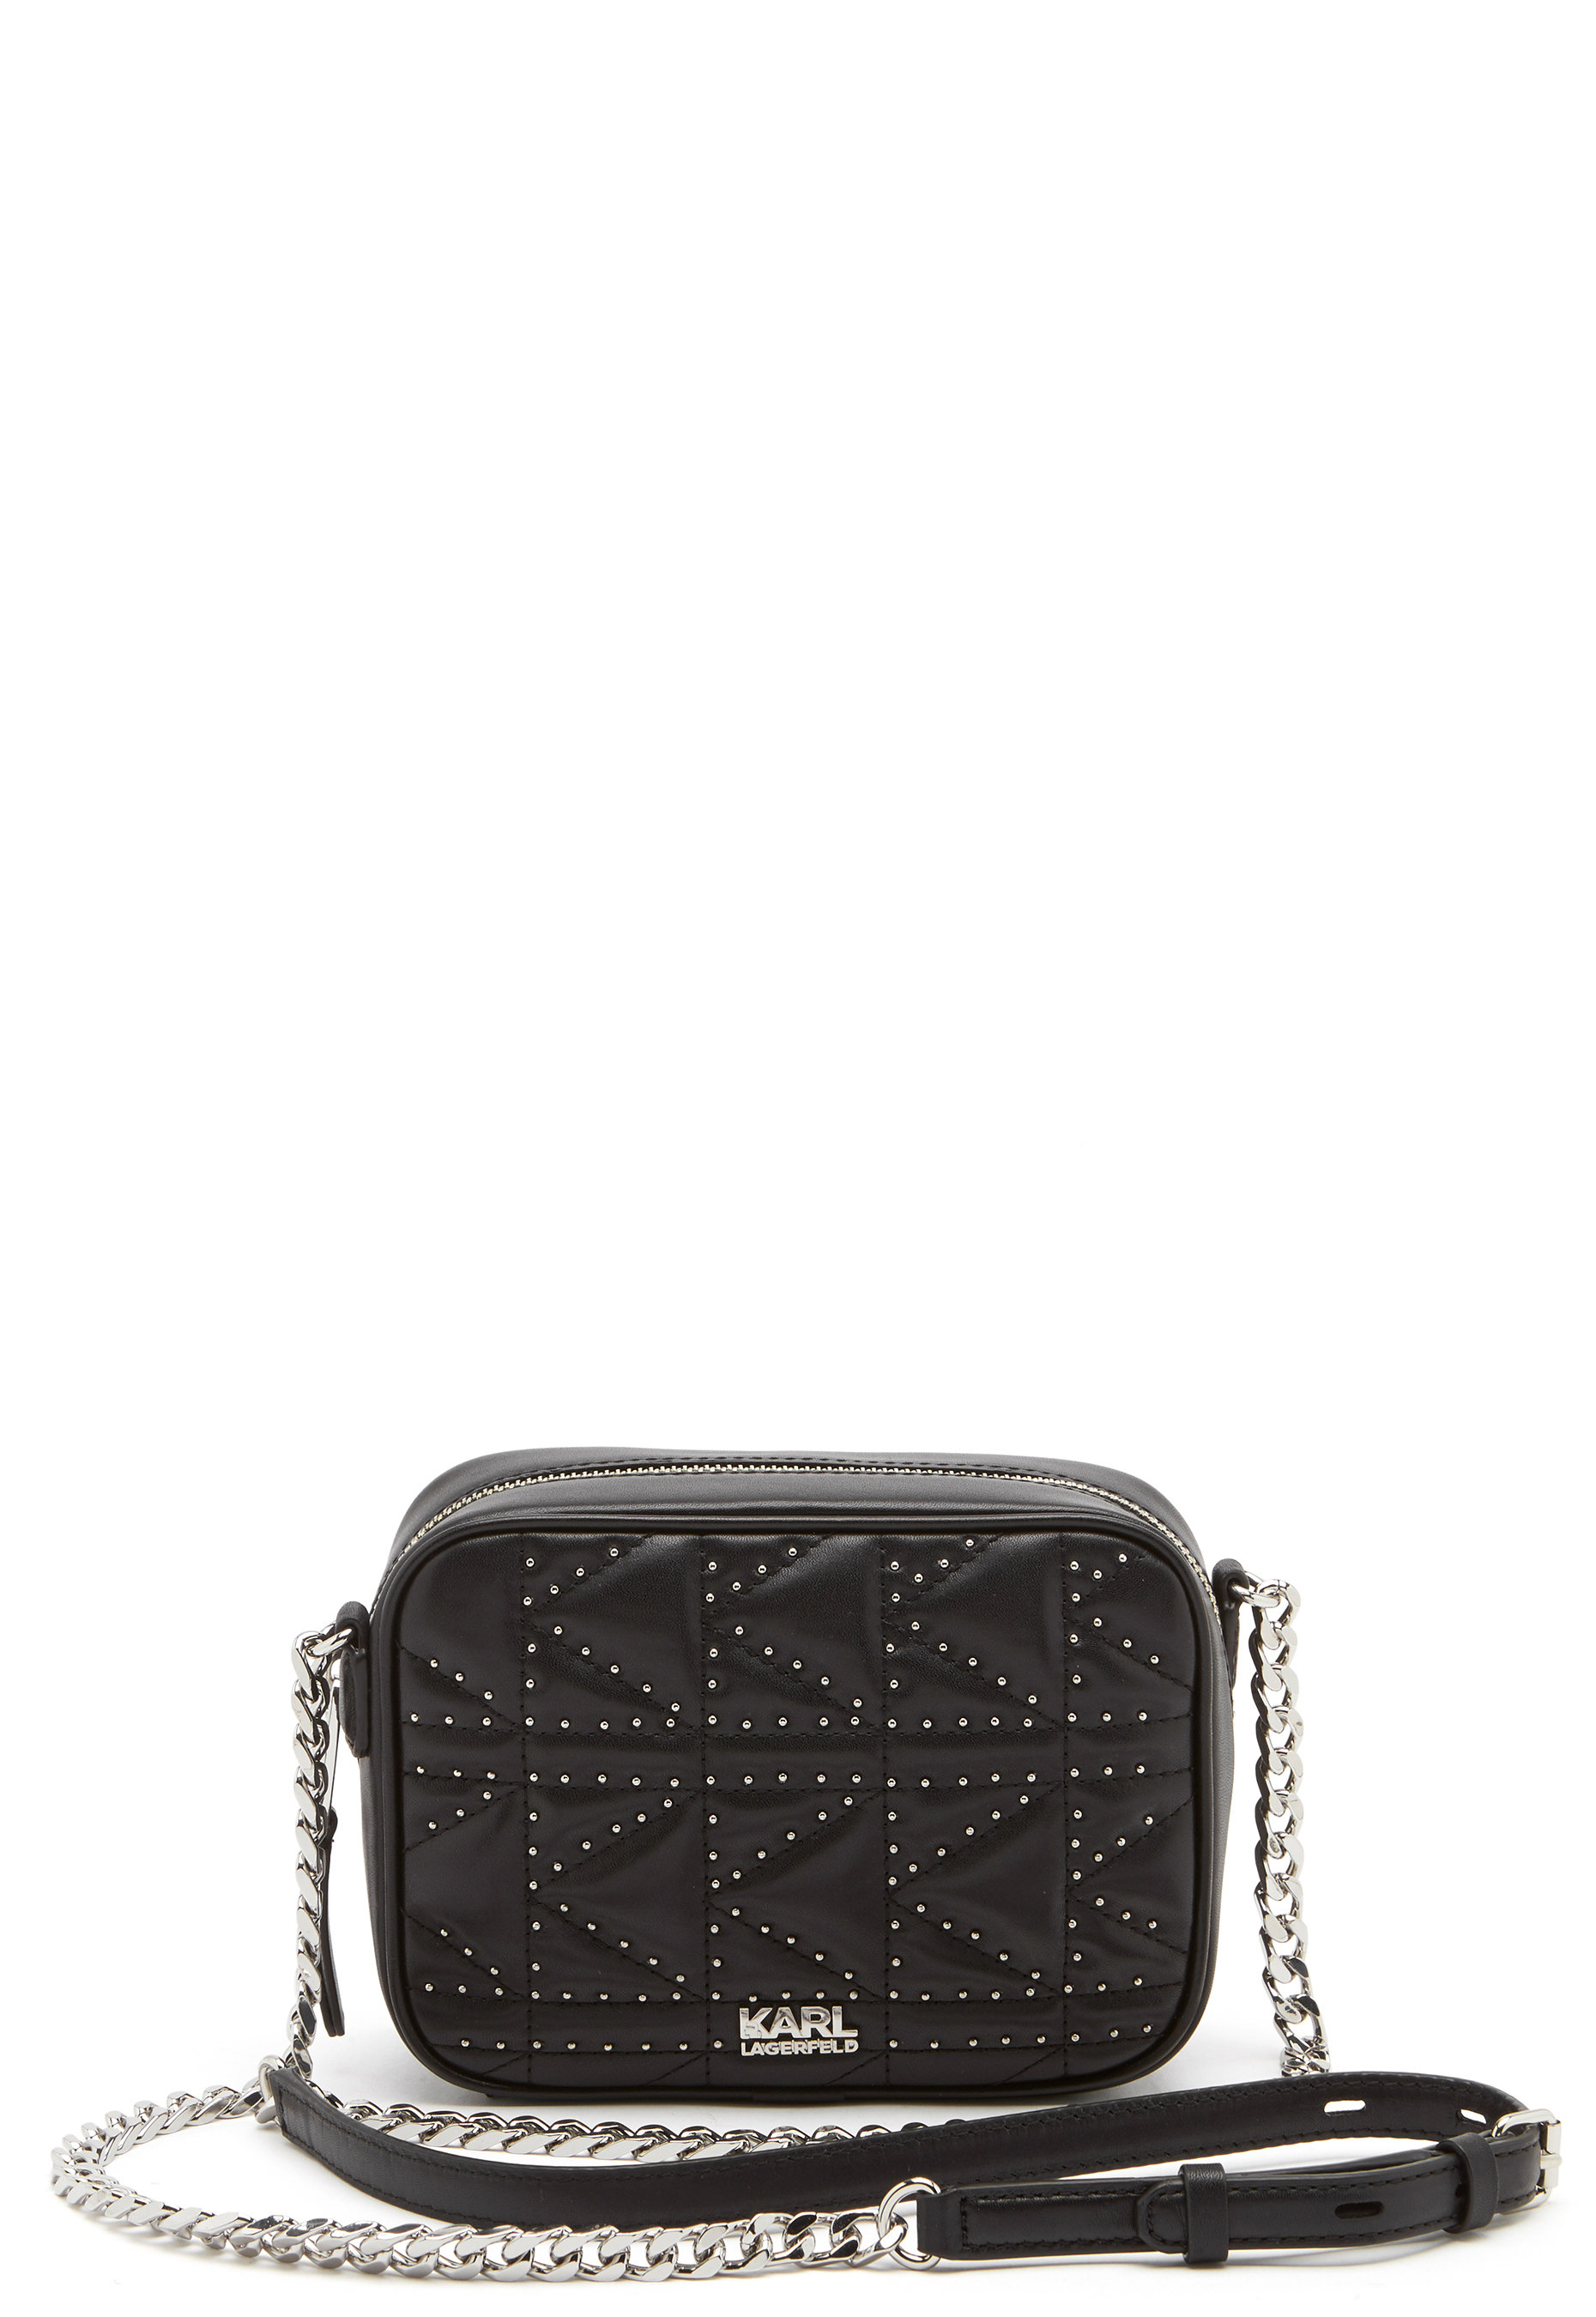 1e34cd7fac Karl Lagerfeld Quilted Stud Camera Bag Black/Nickel - Bubbleroom